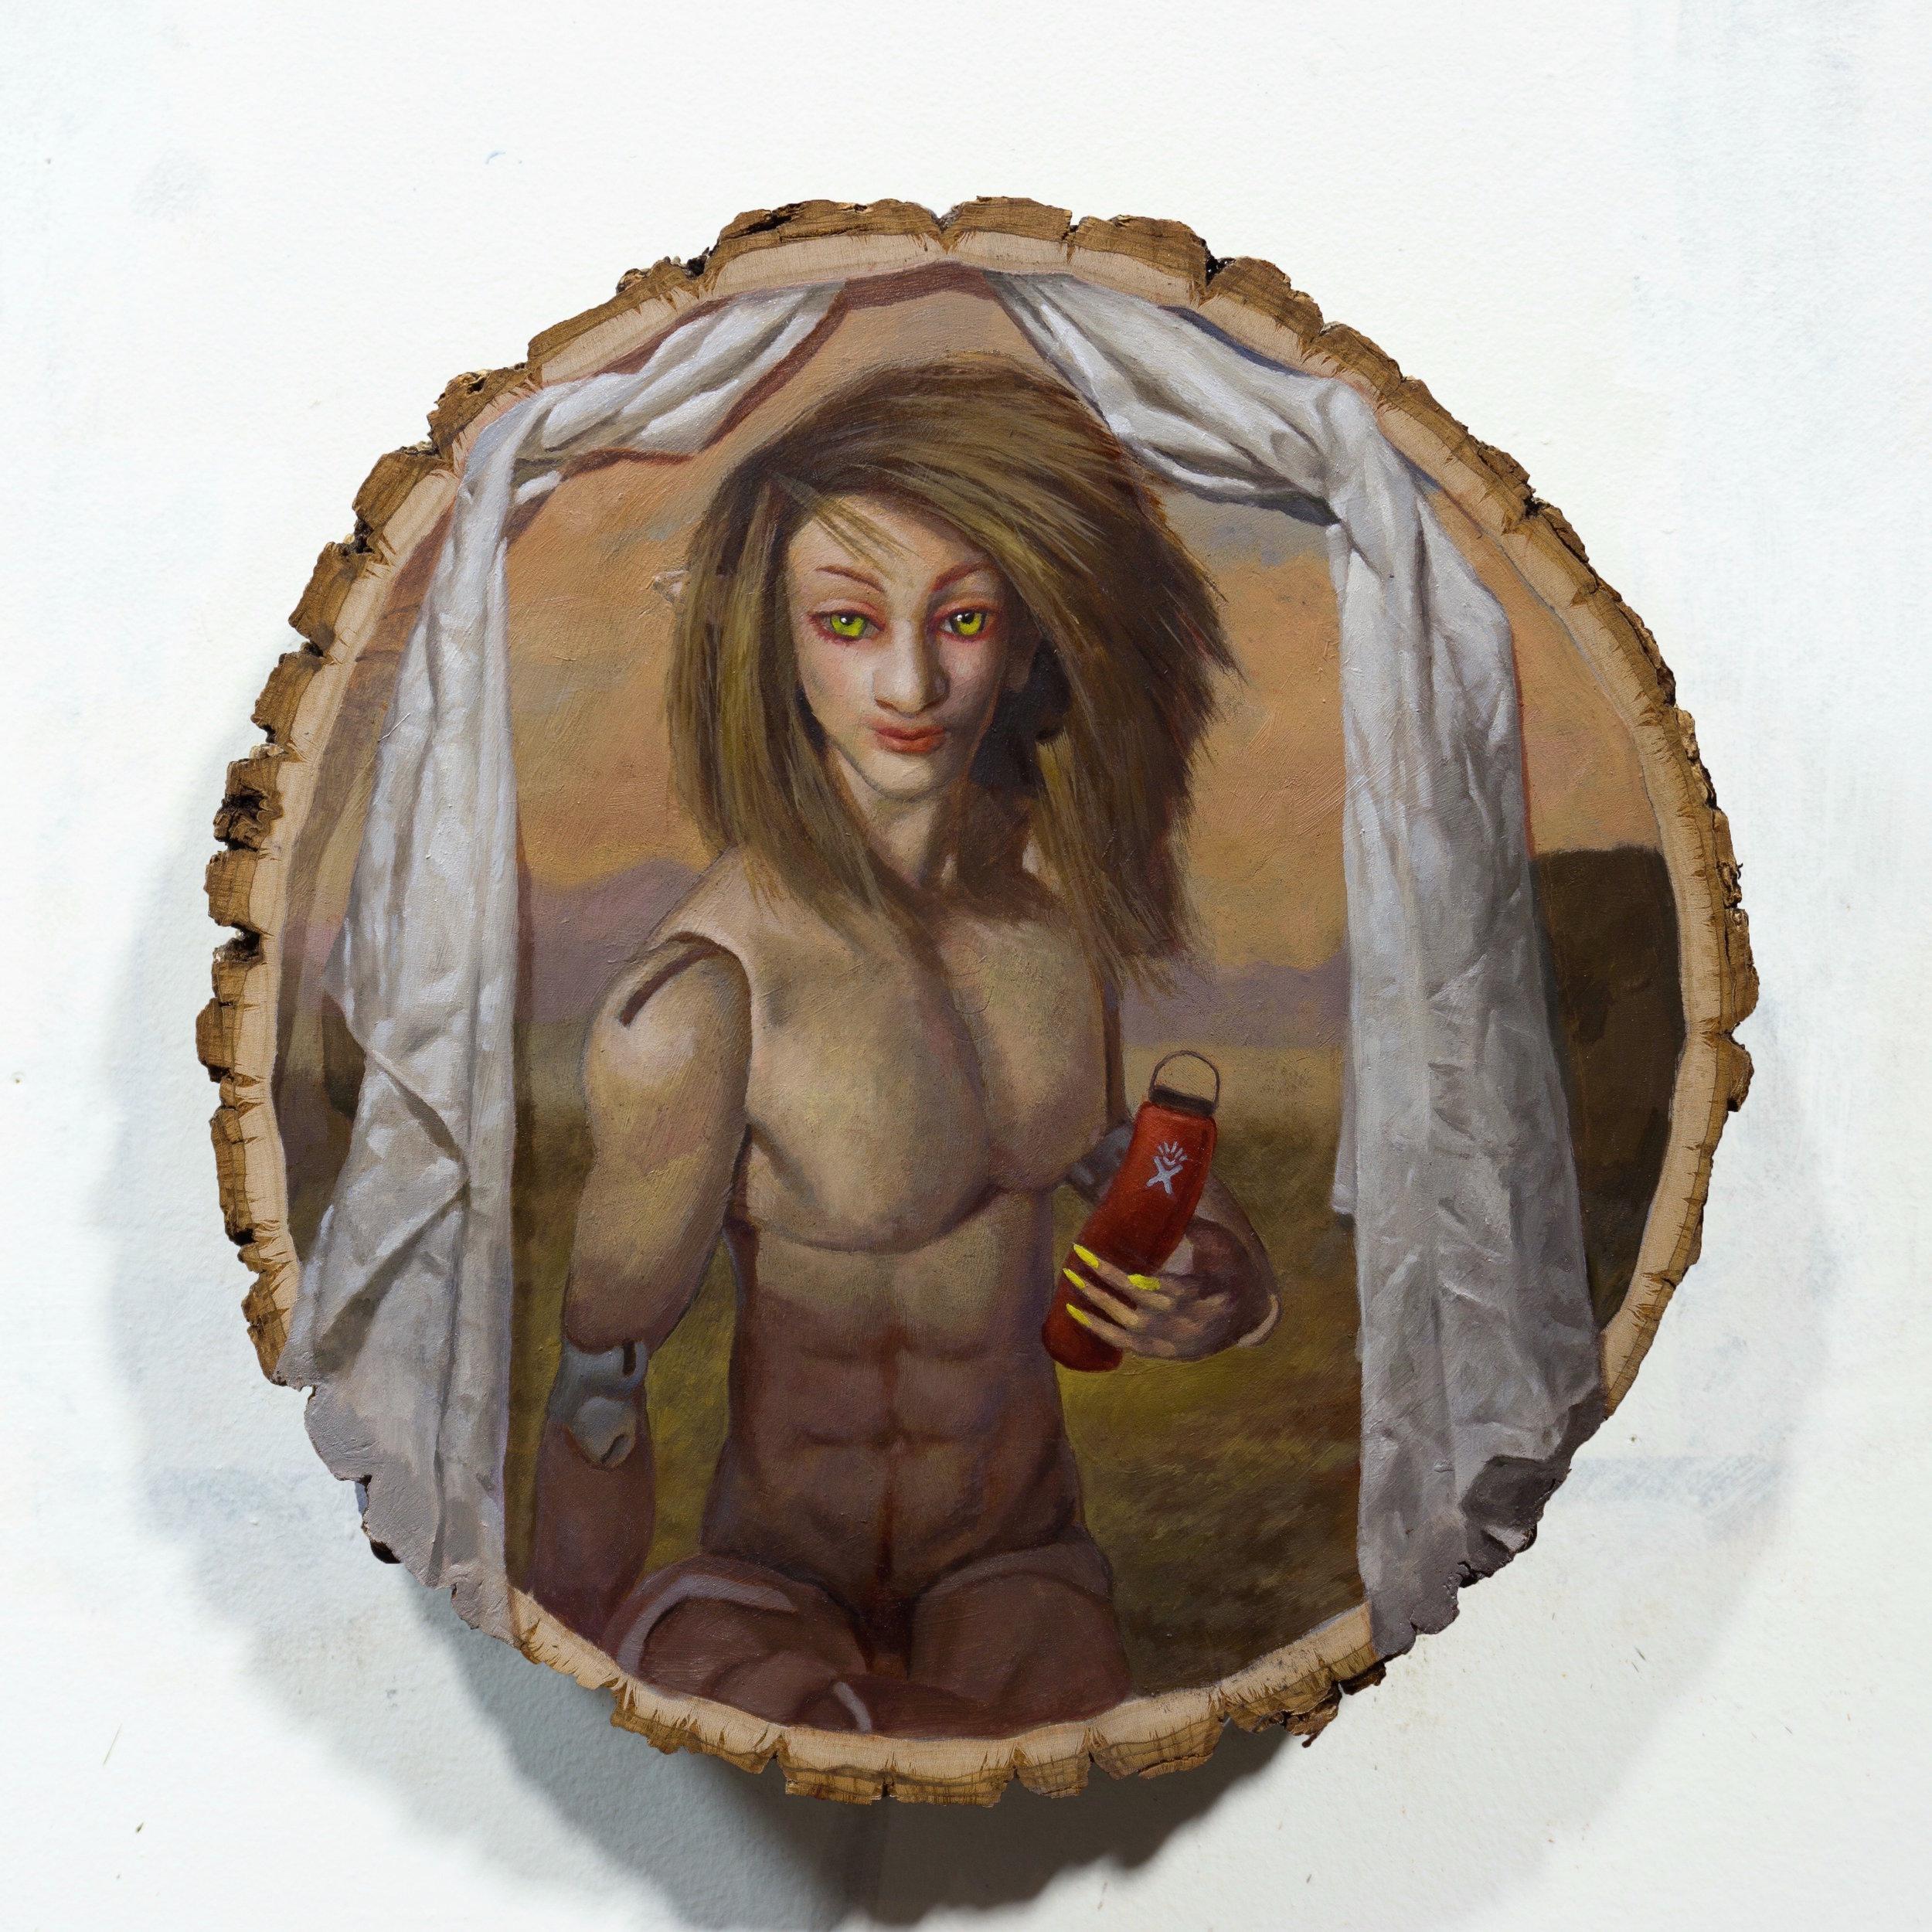 "Hydroflask #ad Oil on decorative wood disk 11x11x2"""